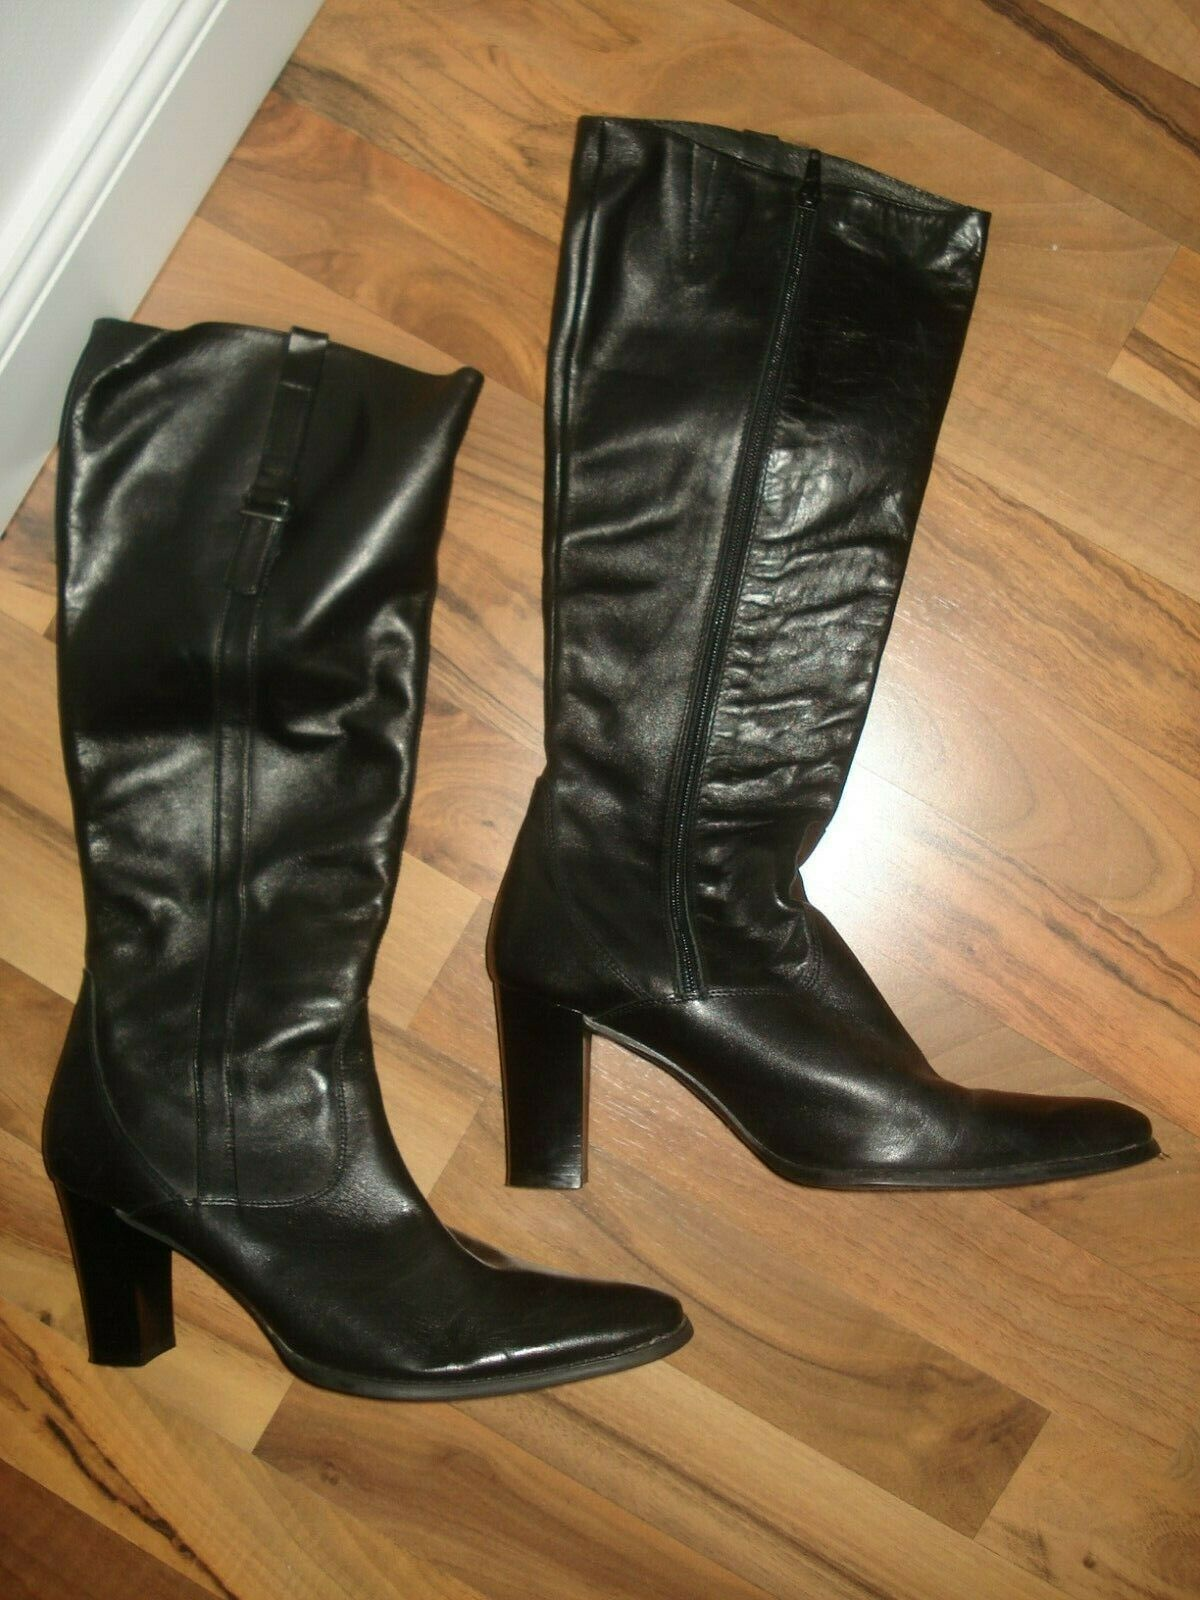 Alba Moda Moda Moda Damen Stiefel Stiefelette Stiefel Gr. 39